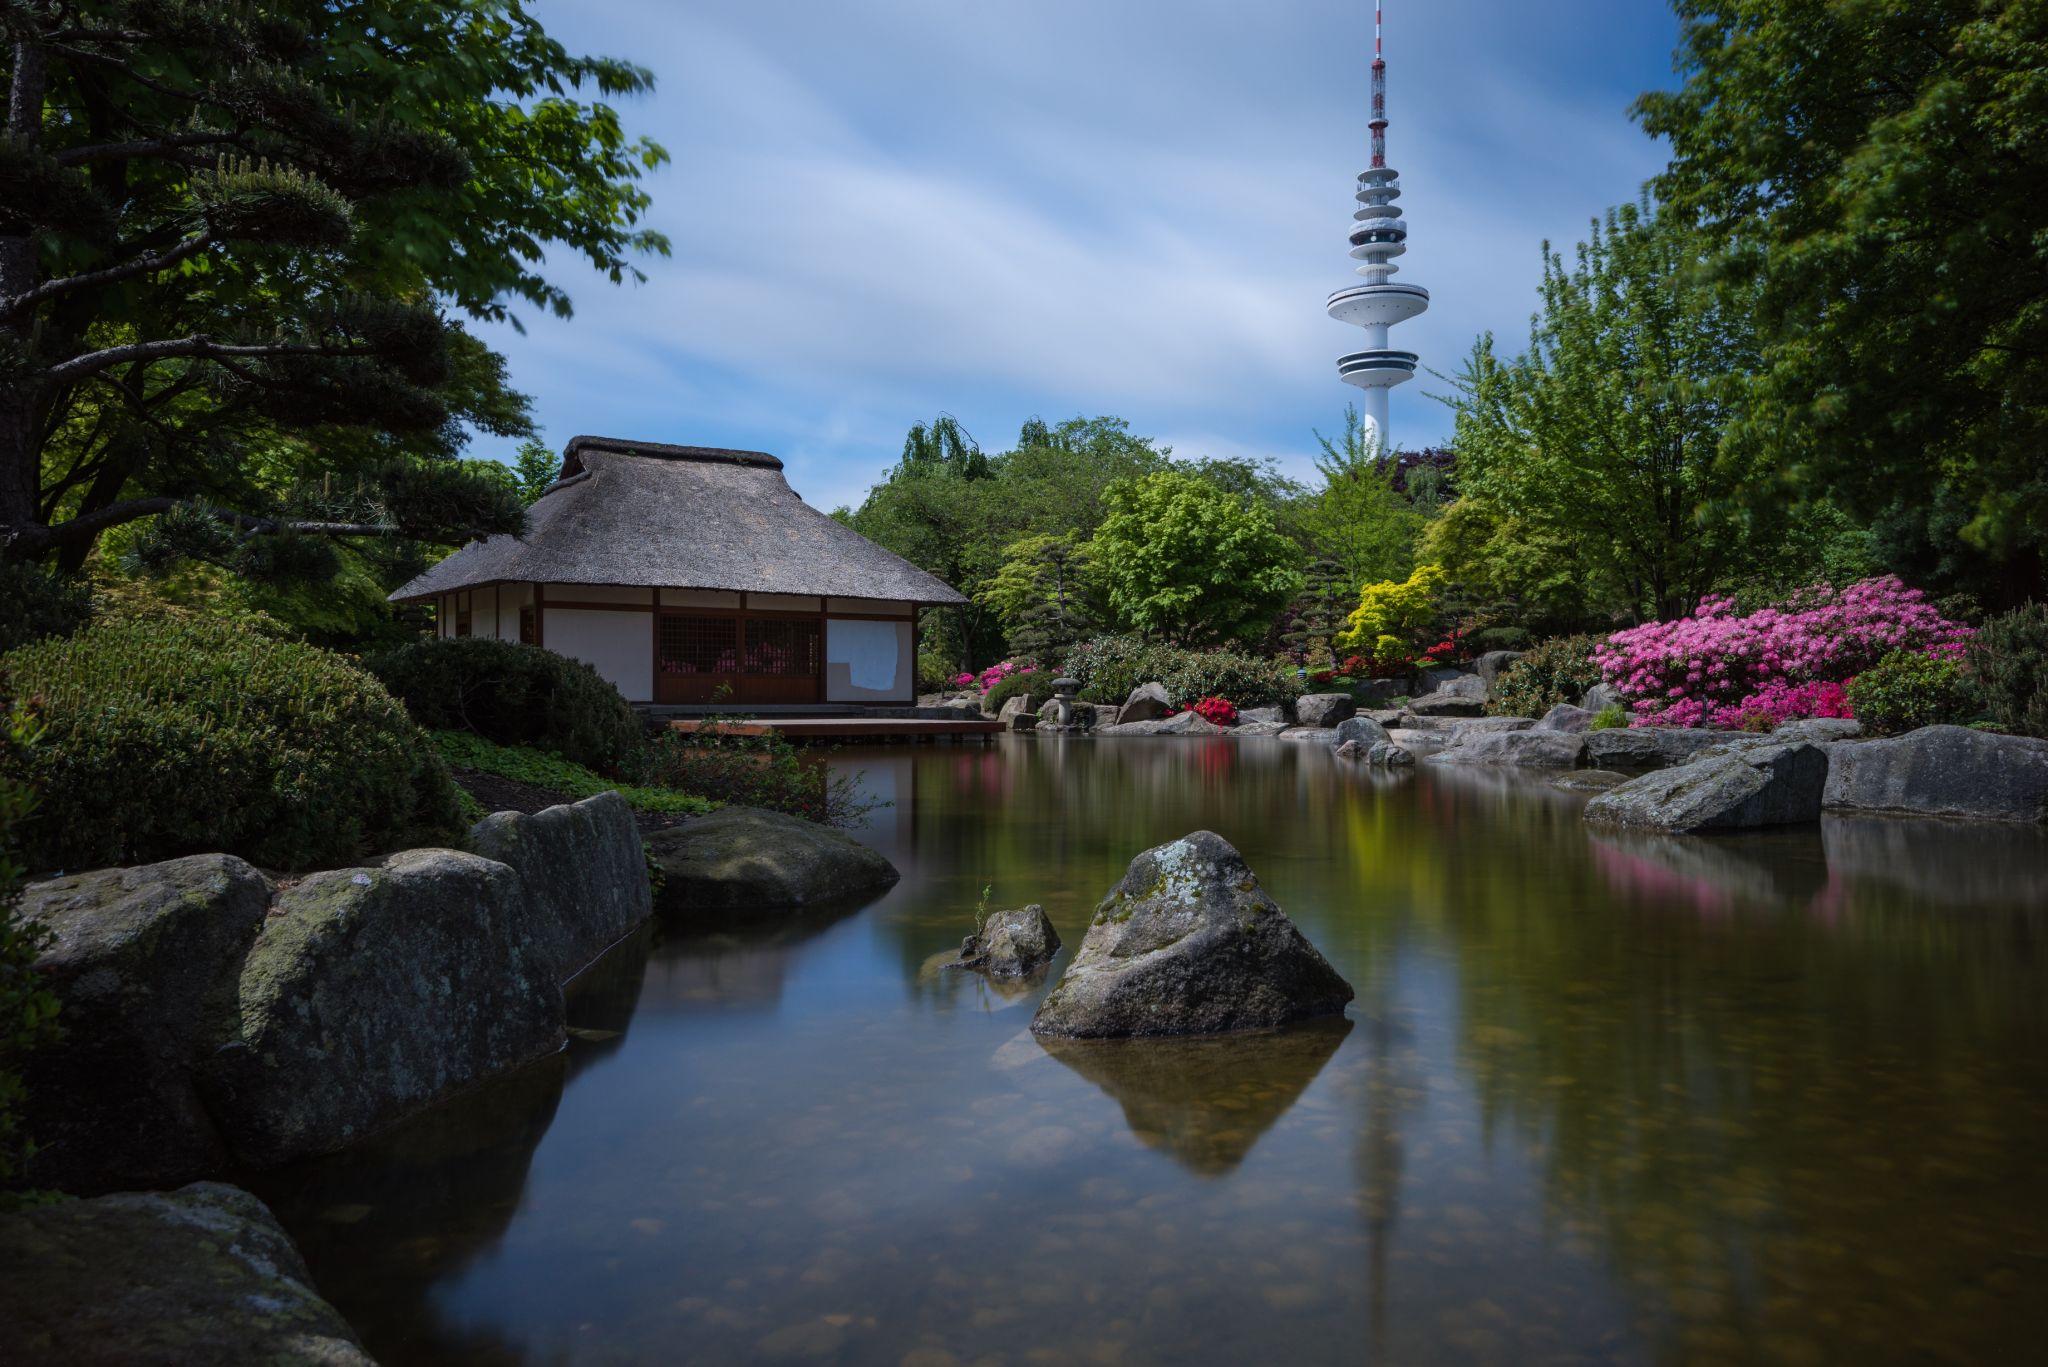 Japanese Garden in 'Planten un Bloomen', Germany